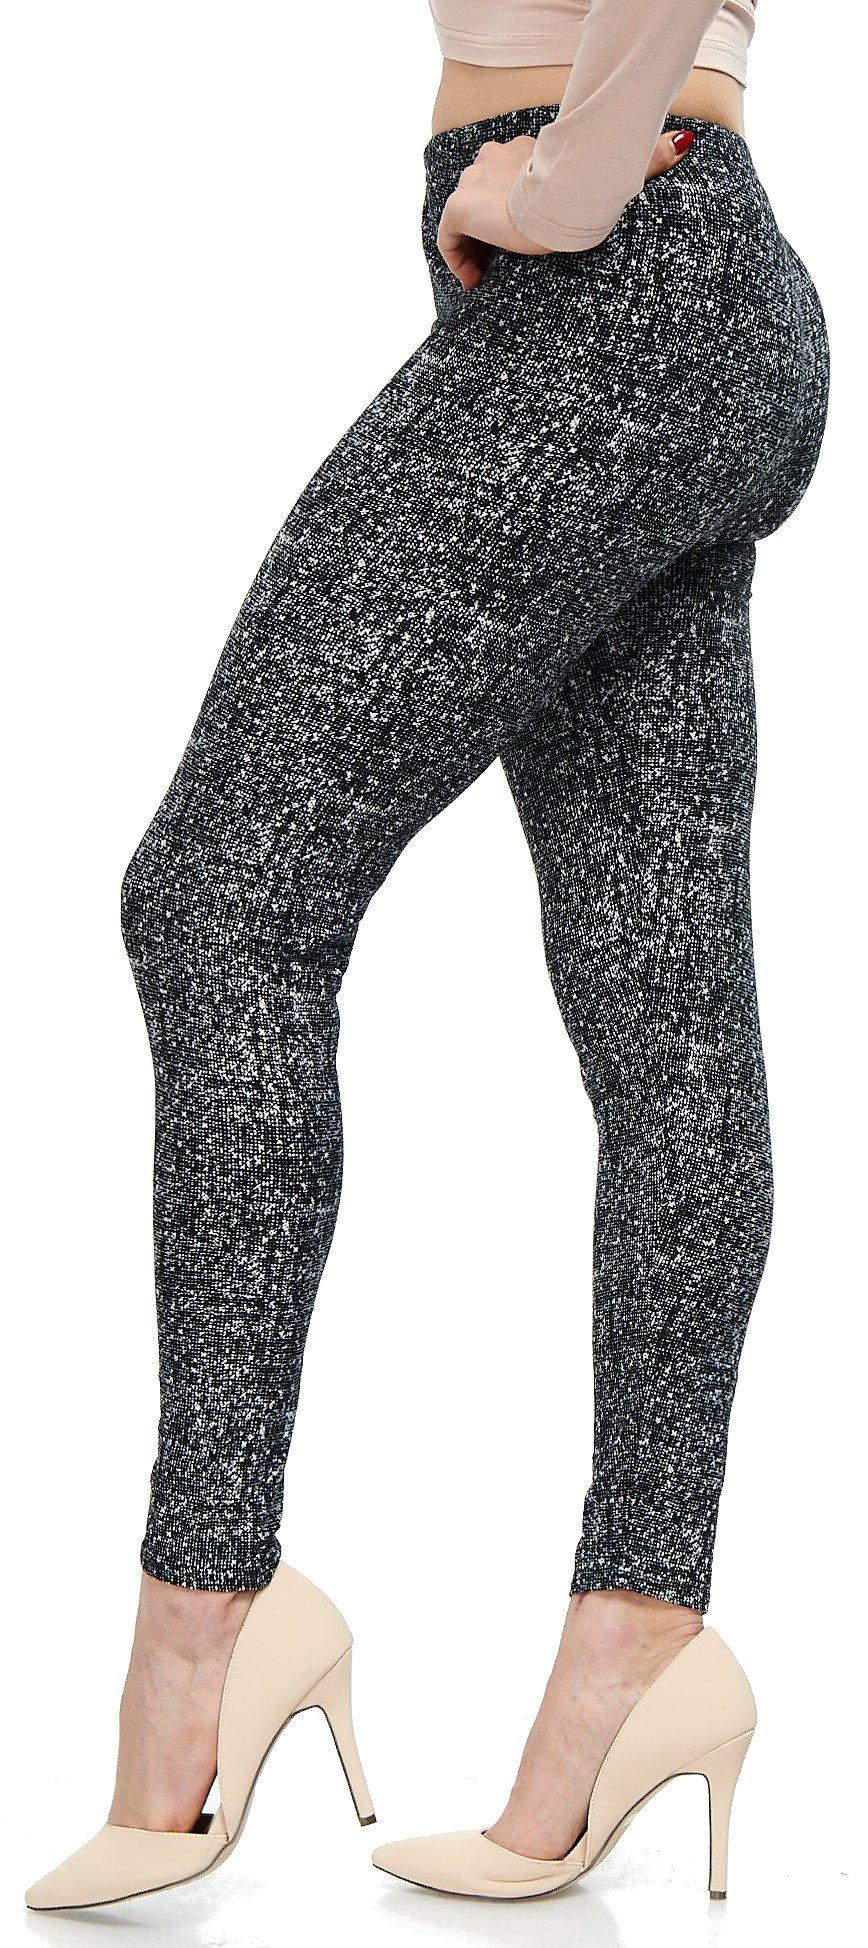 LMB Lush Moda Extra Soft Leggings with Designs- Variety of Prints - 760F Black White Abstract B5